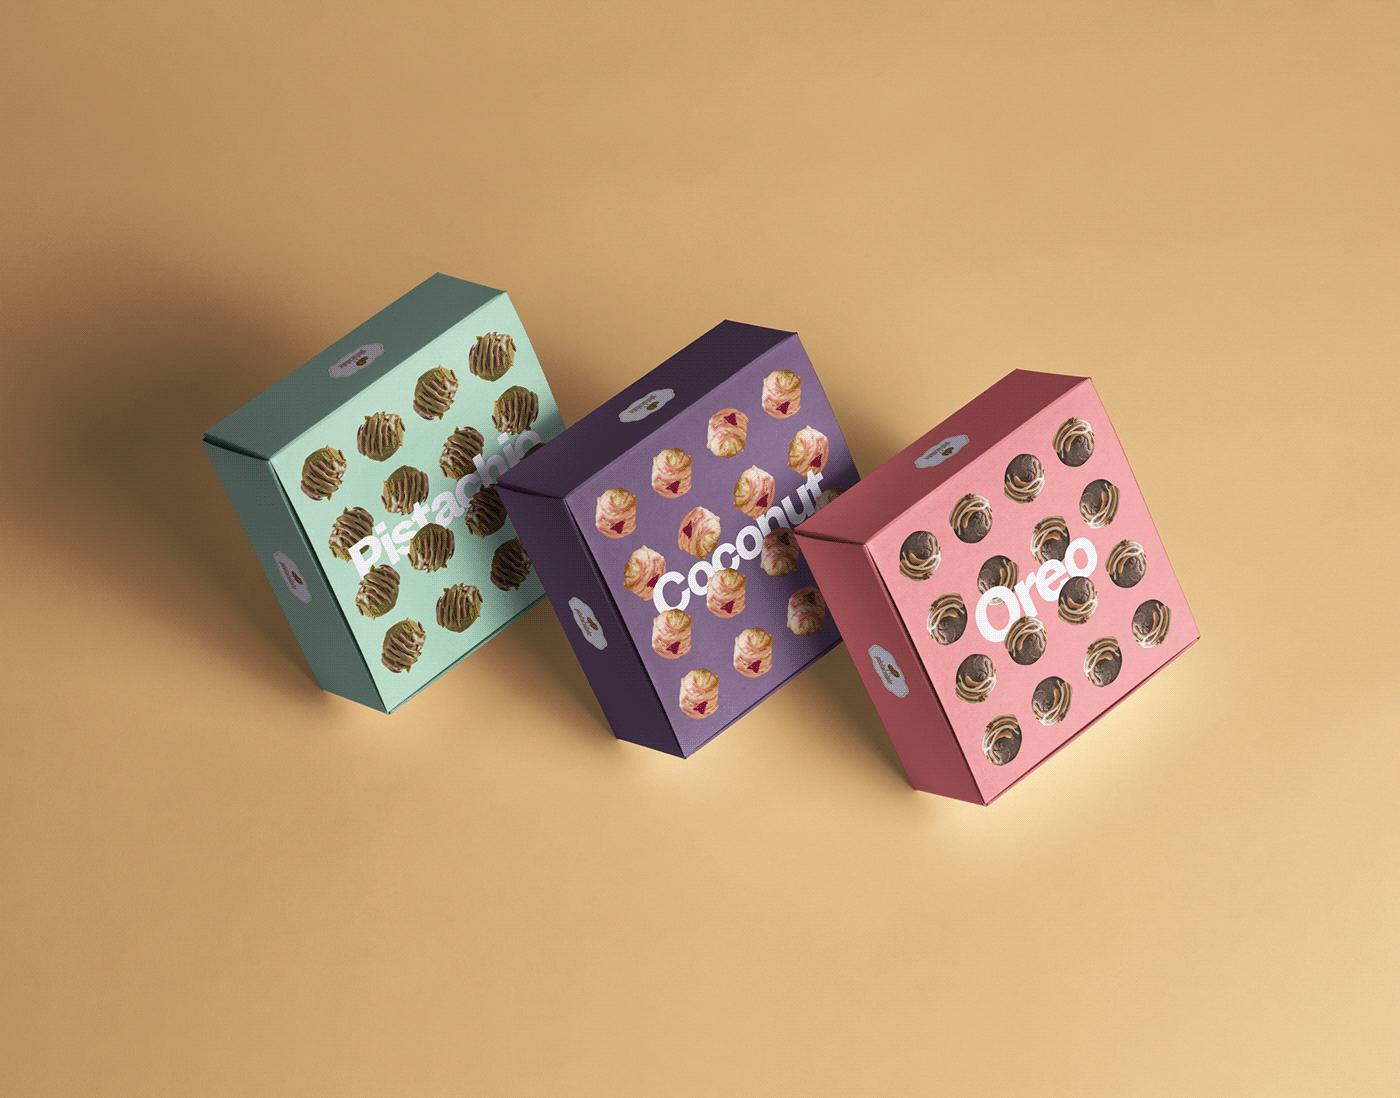 Pistacolate Qatar,Pistacolate,Taqniaqa,Taqnia Qatar